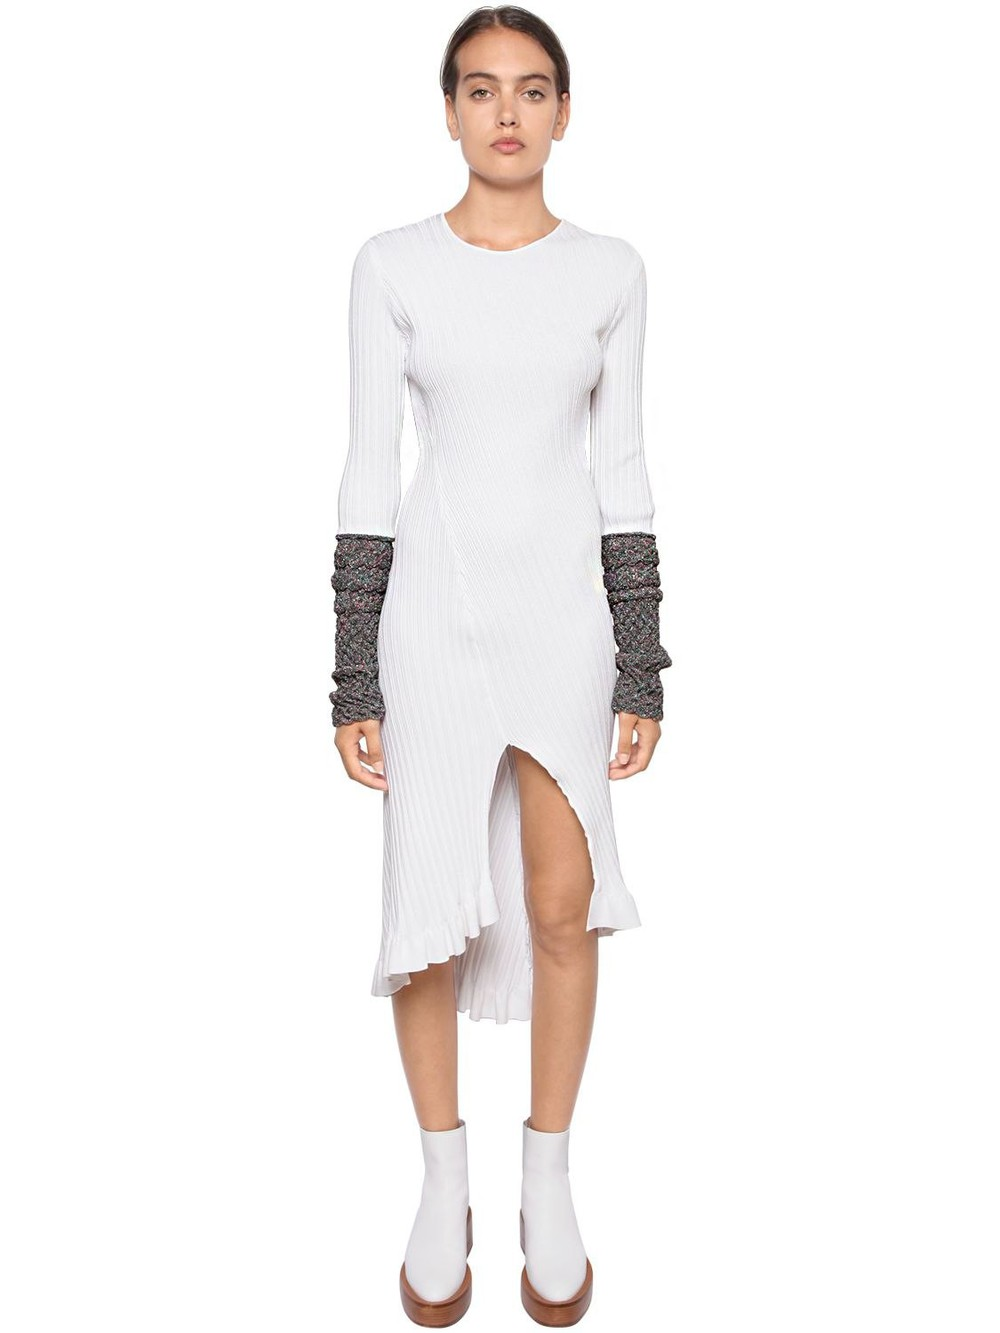 ESTEBAN CORTAZAR Ribbed Knit Midi Dress W/ Lurex Cuffs in white